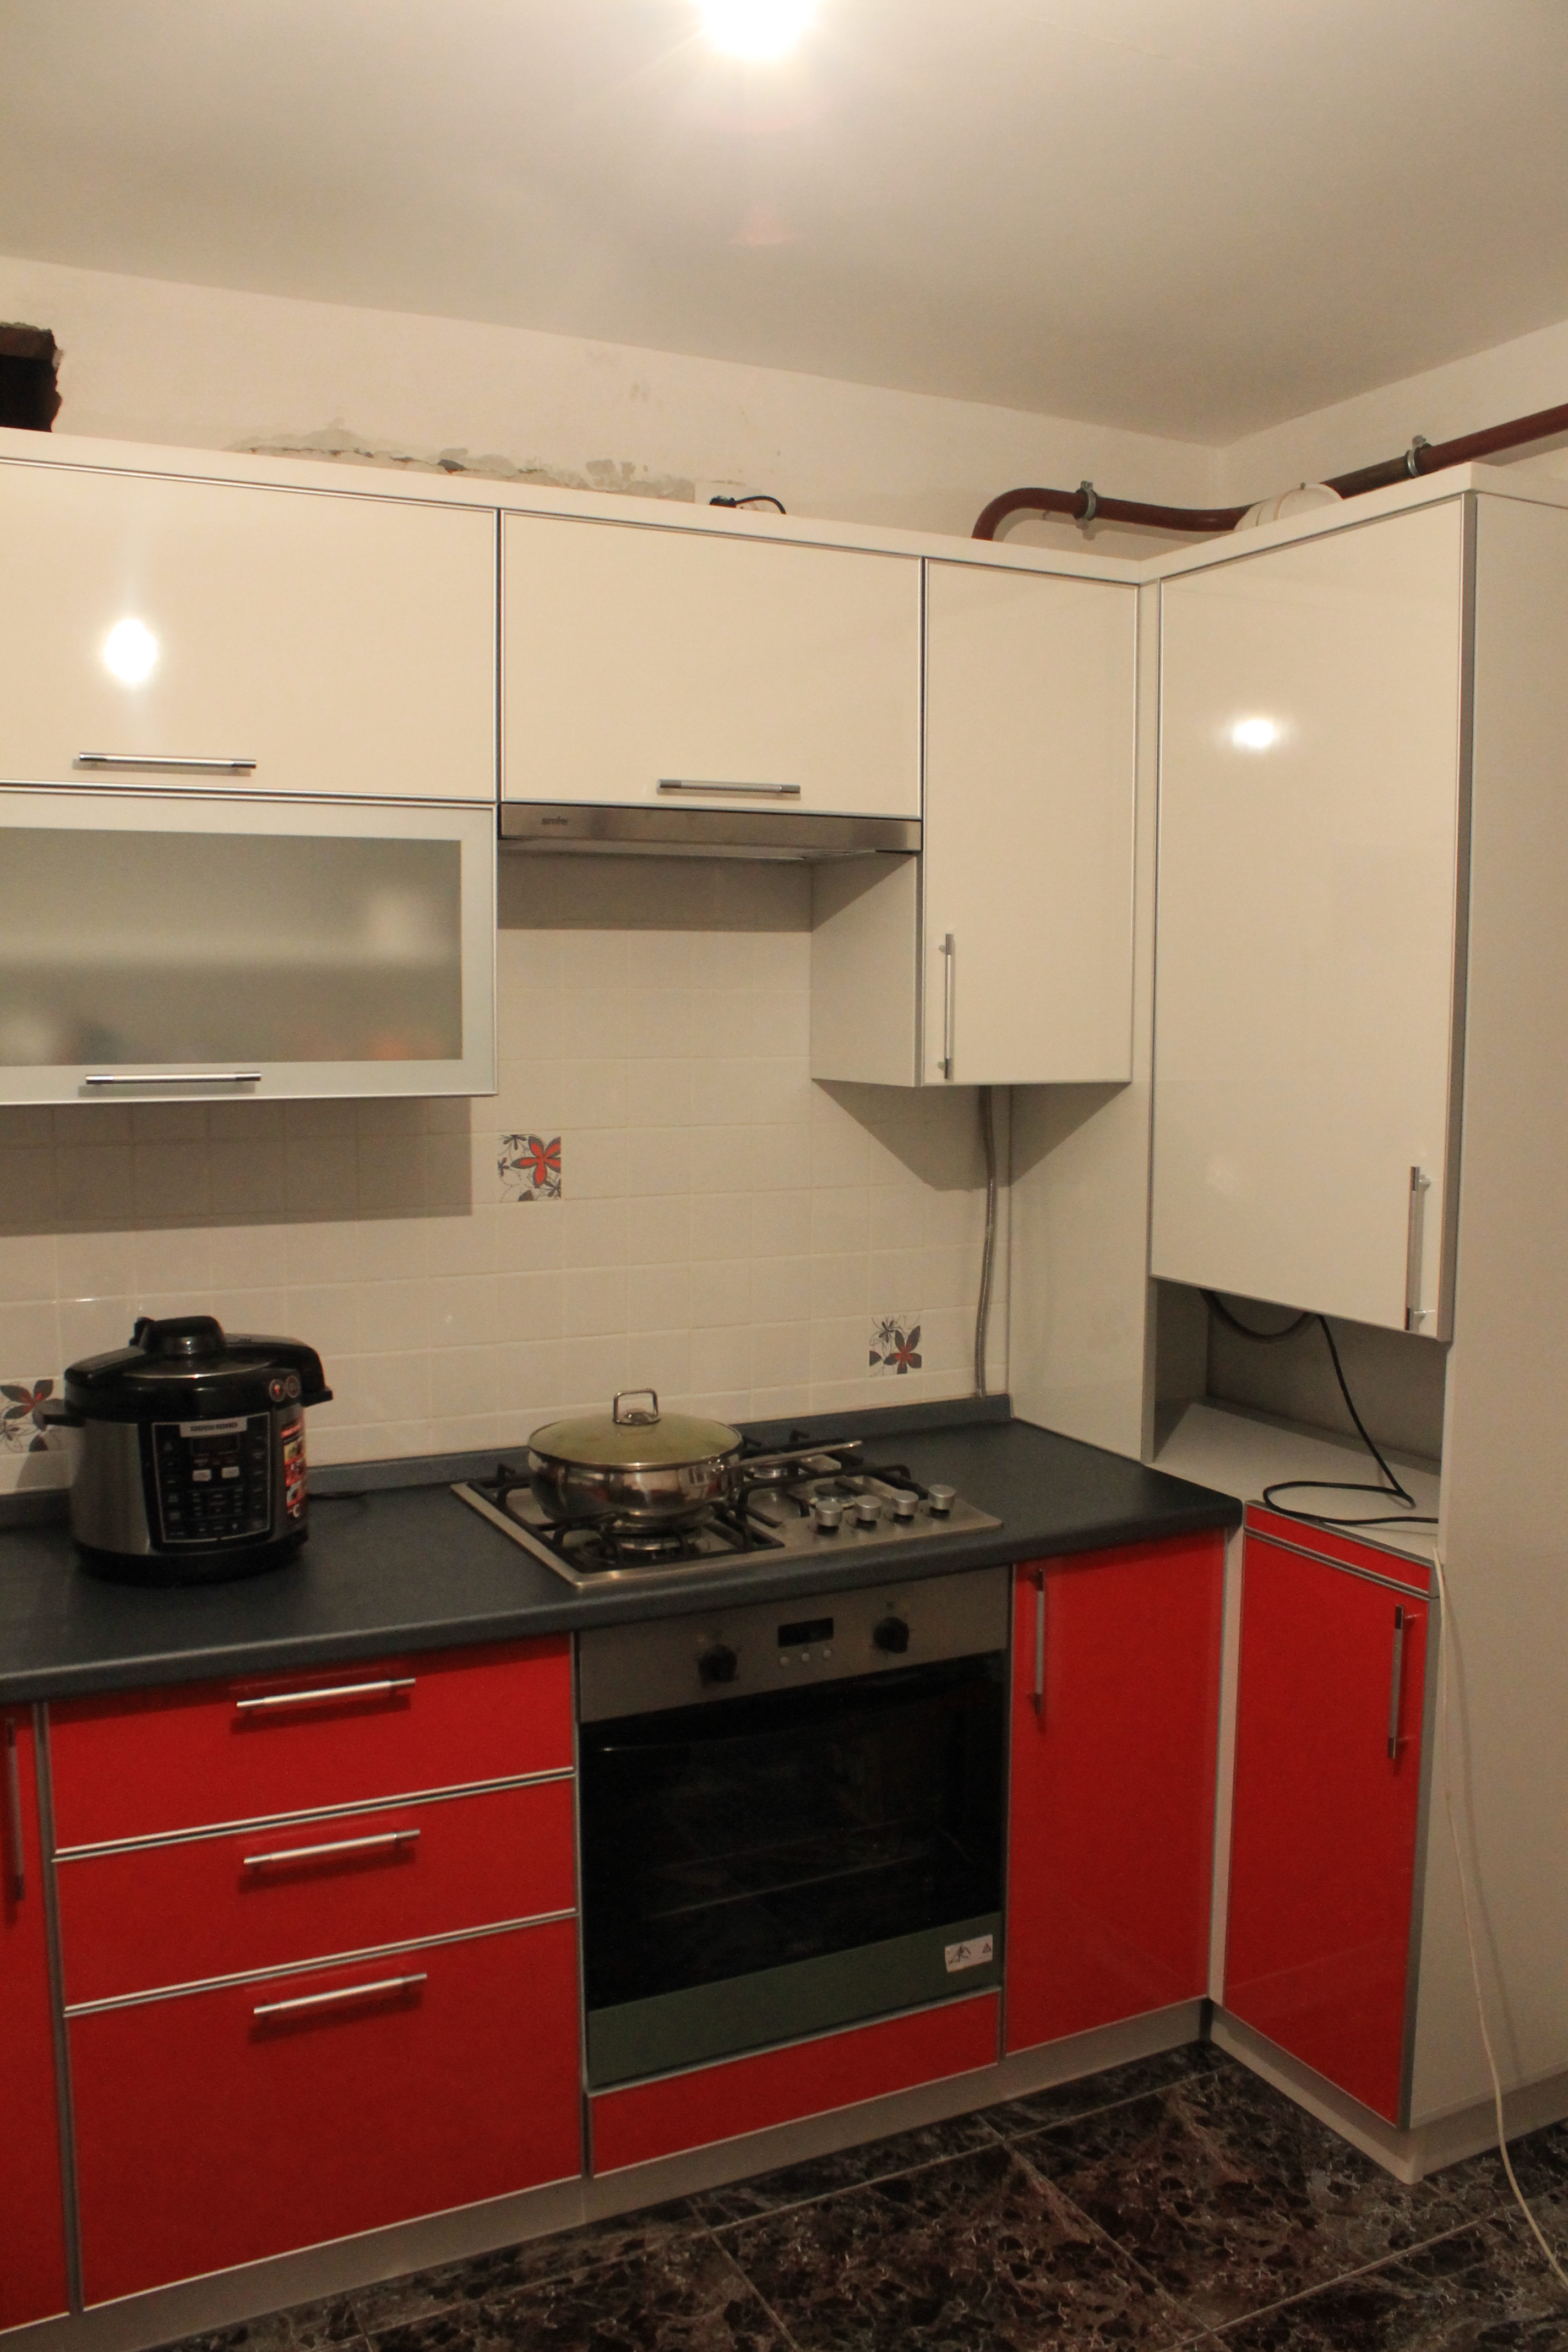 фото кухни чебоксары 017.jpg